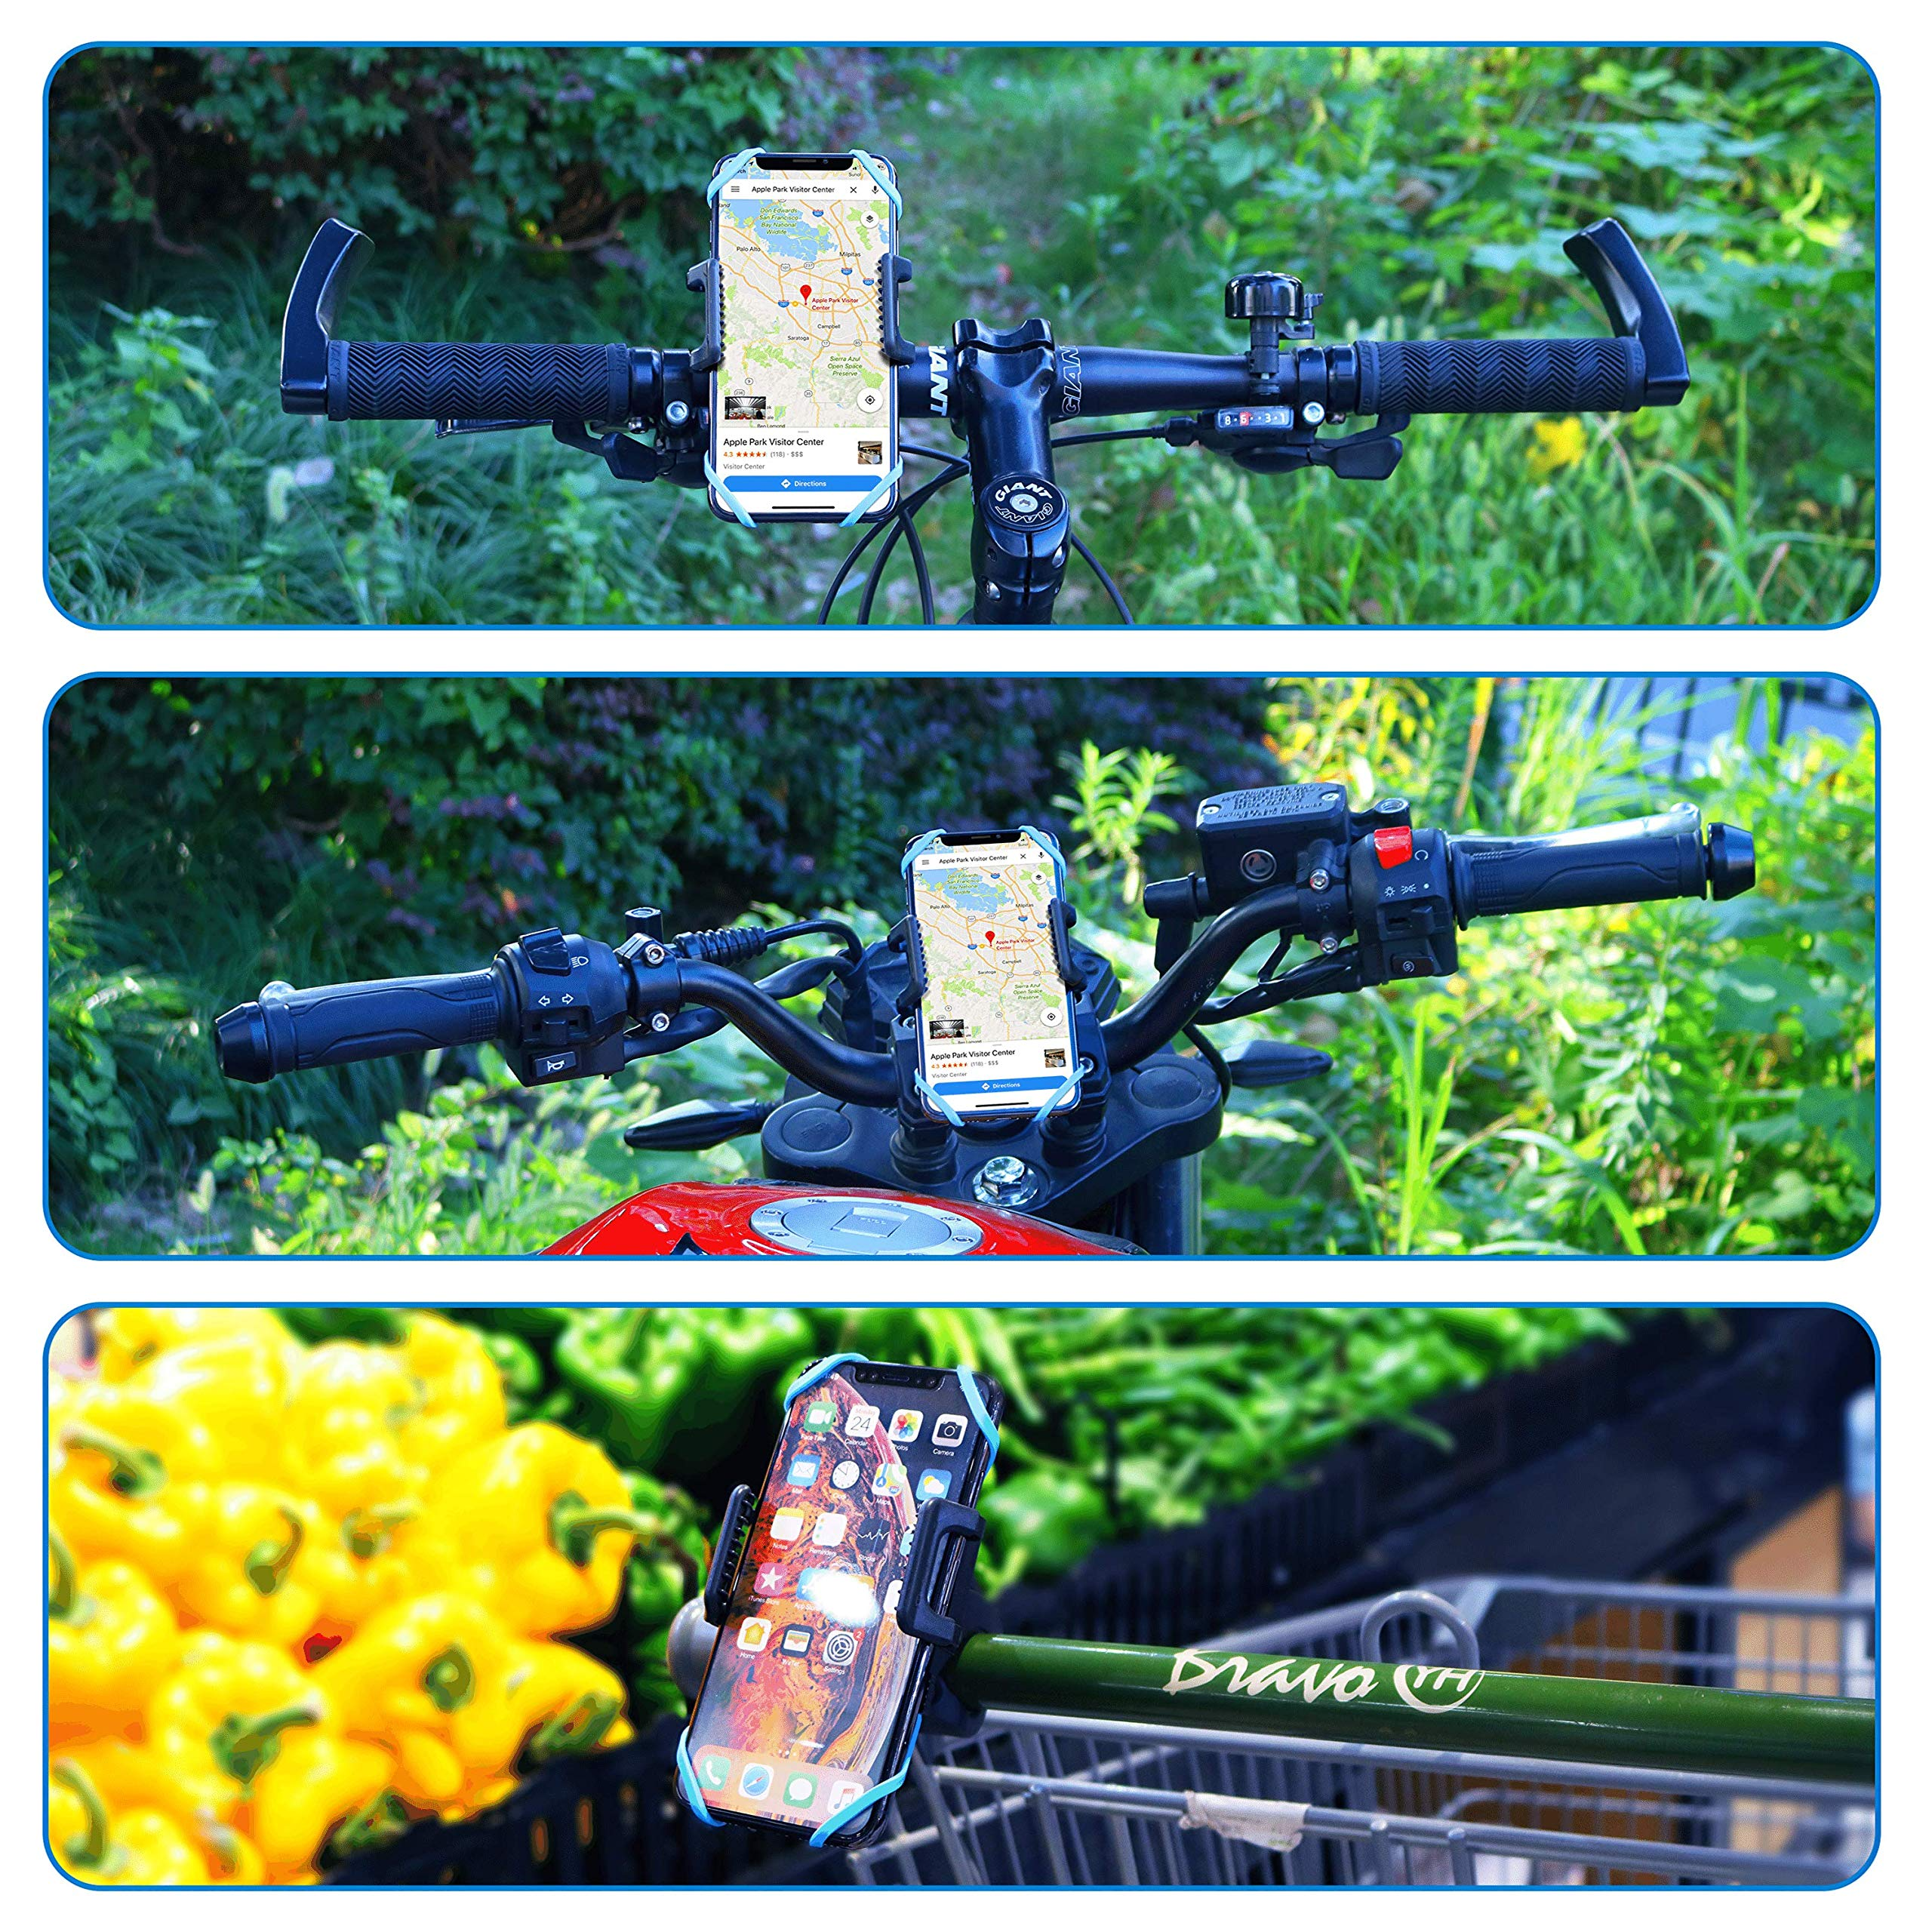 PREMIUM Bike Phone Holder Mount - Universal Mounts for Bicycle, Motorcycle, Motorbike, Moped, Scooter, Pram - All Handlebars & 360° - AntiShake & NonSlip - 3.5 to 6.5 Inch Smartphone - Waterproof